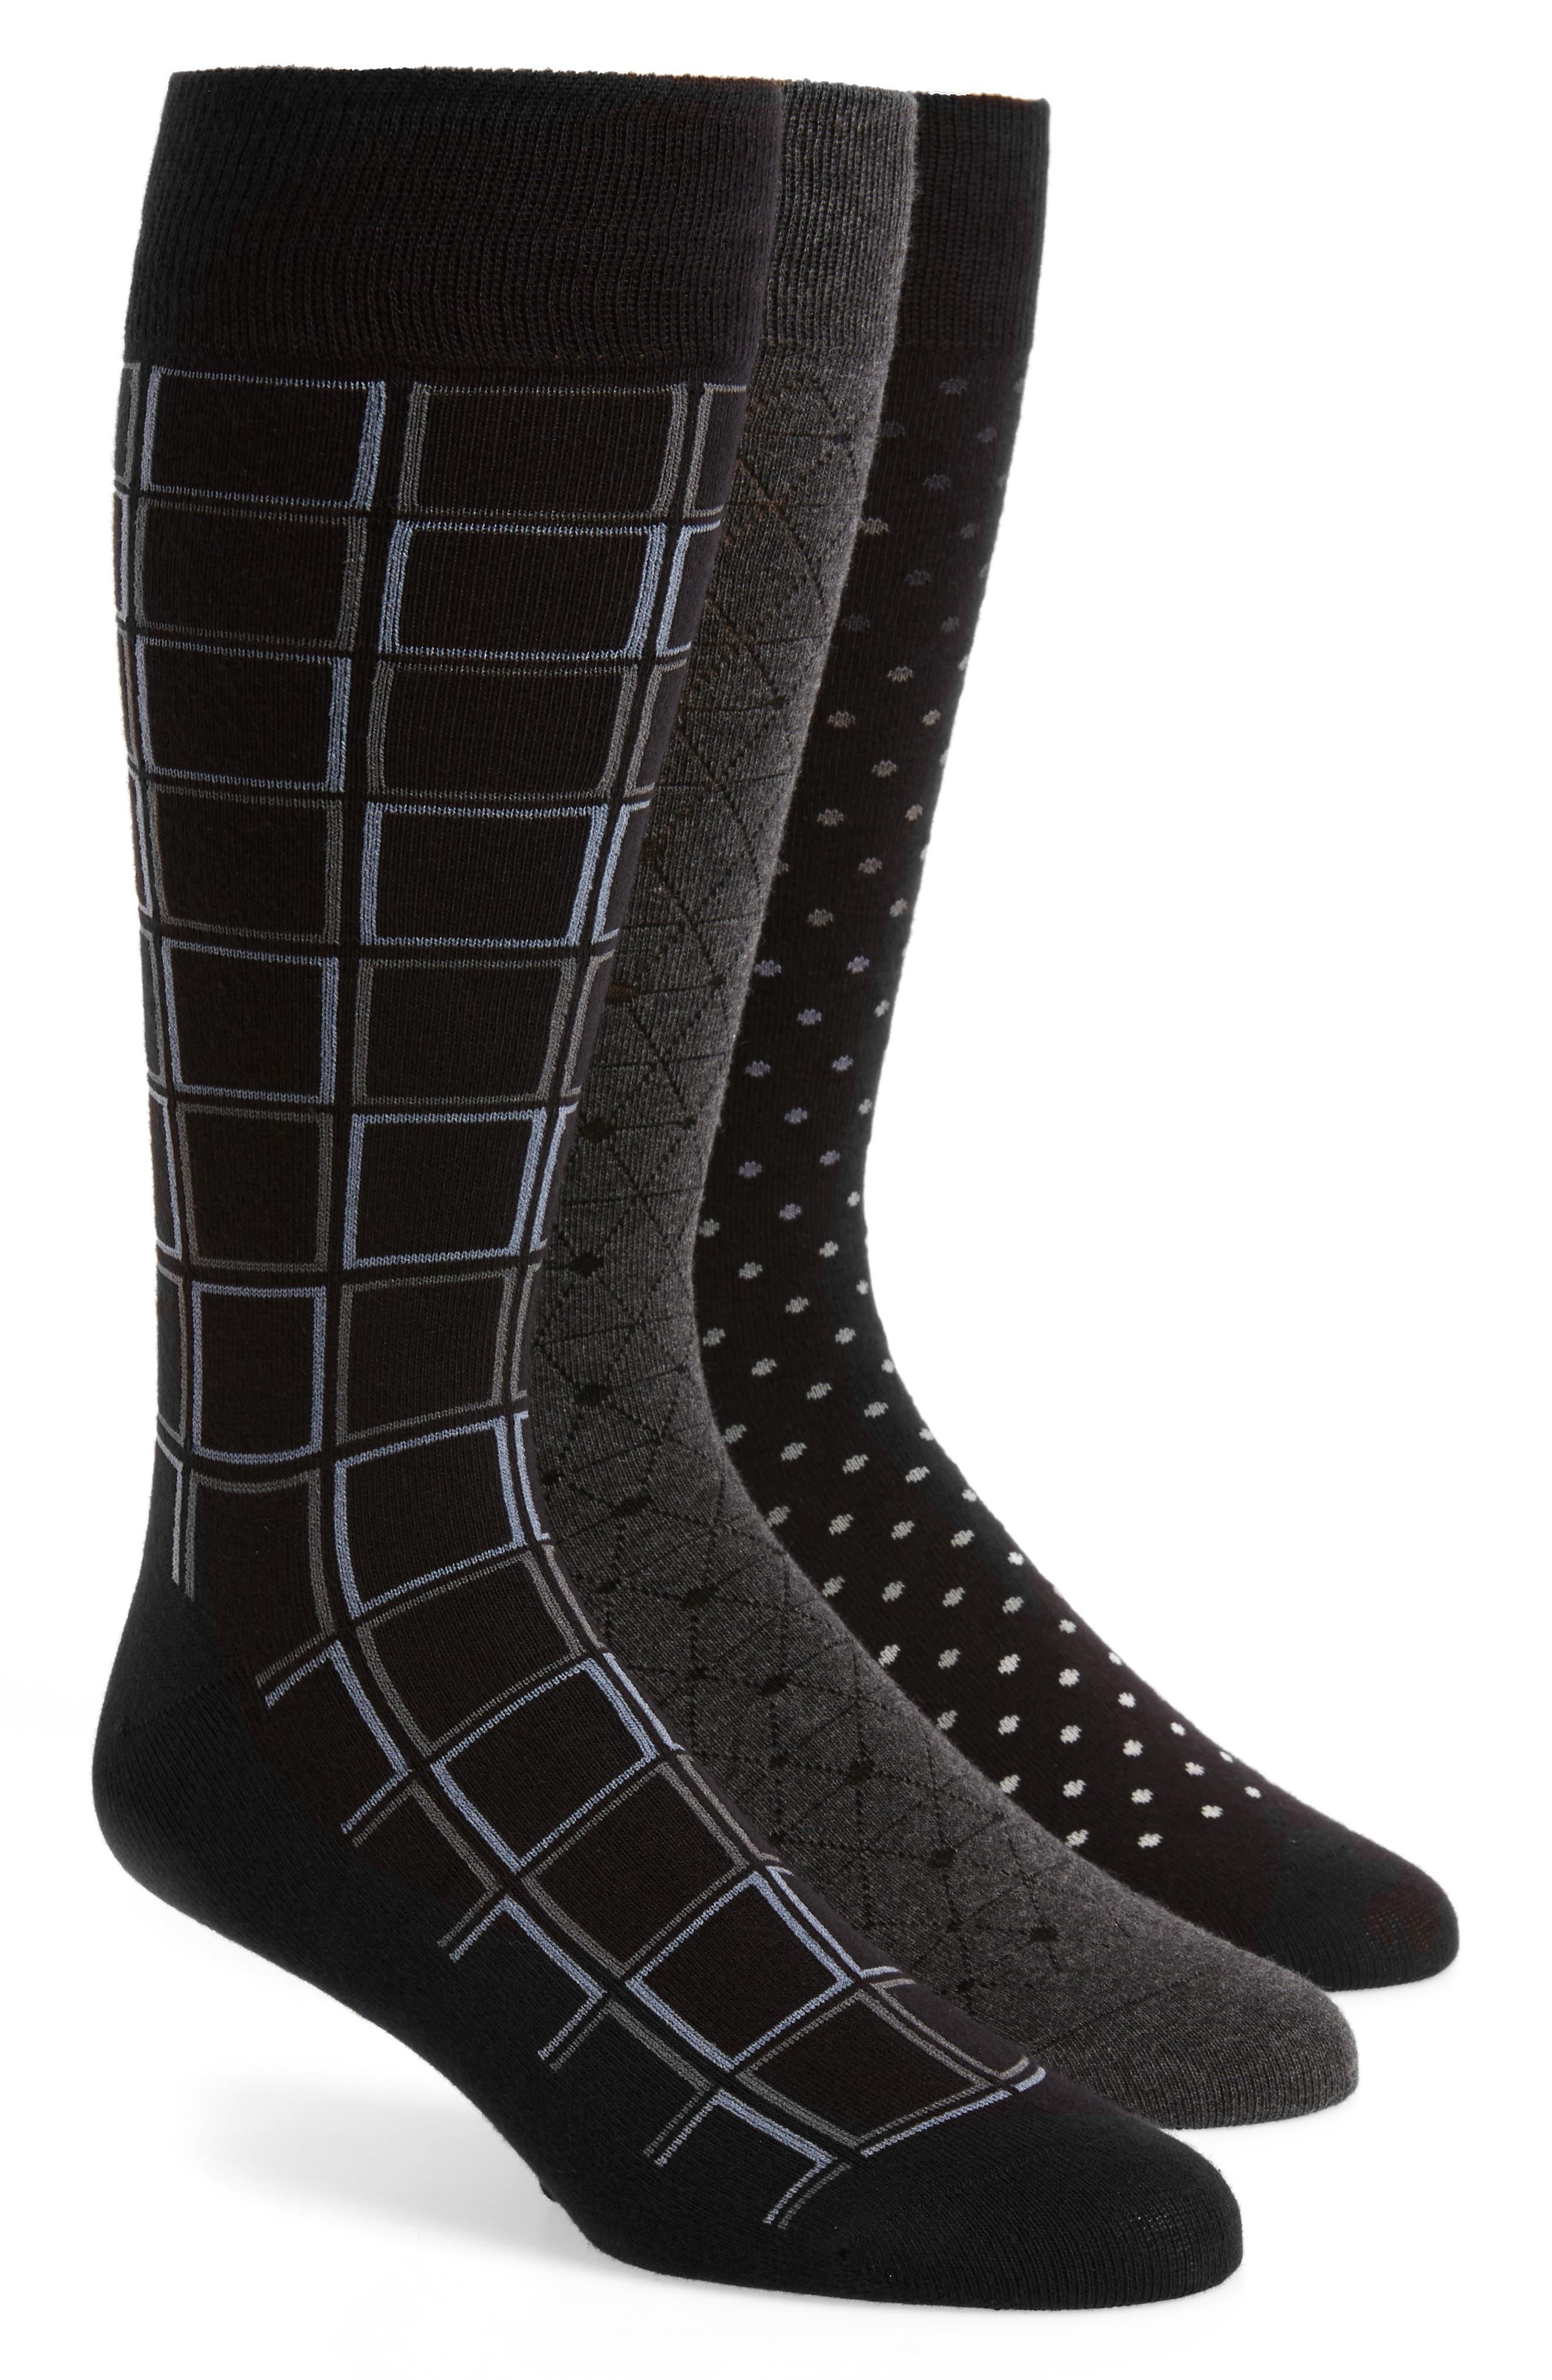 Calibrate 3-Pack Mixed Pattern Socks